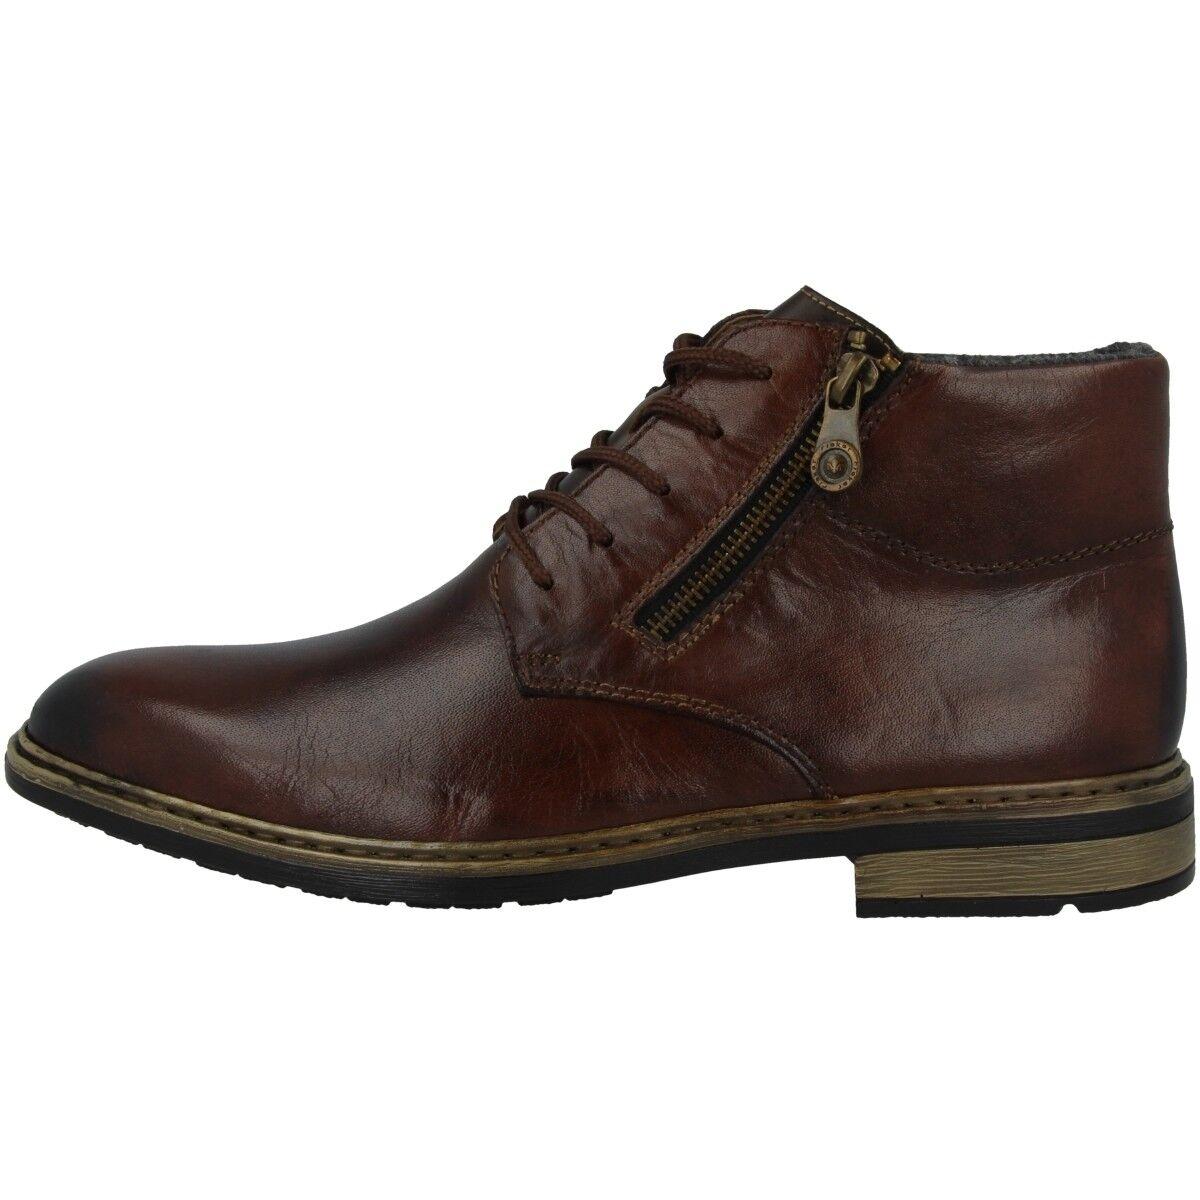 Rieker Nobel shoes men Anti-stress Stivali Bassi Lacci brown F1233-25